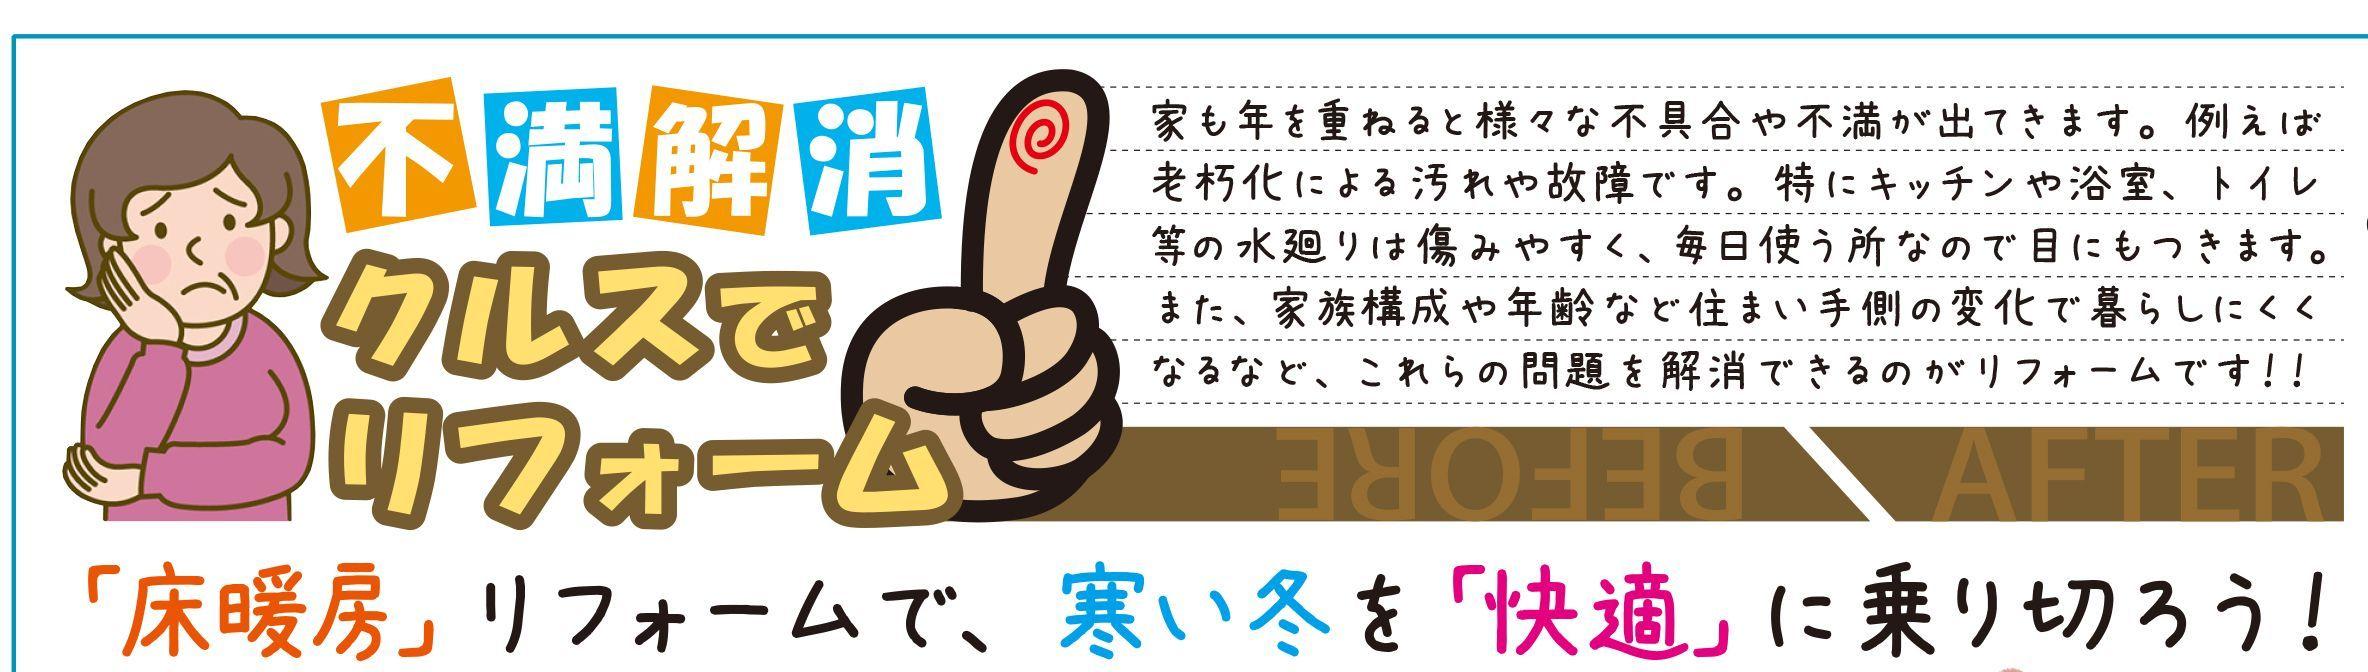 KuraSi-natu-sin101-0501.jpg